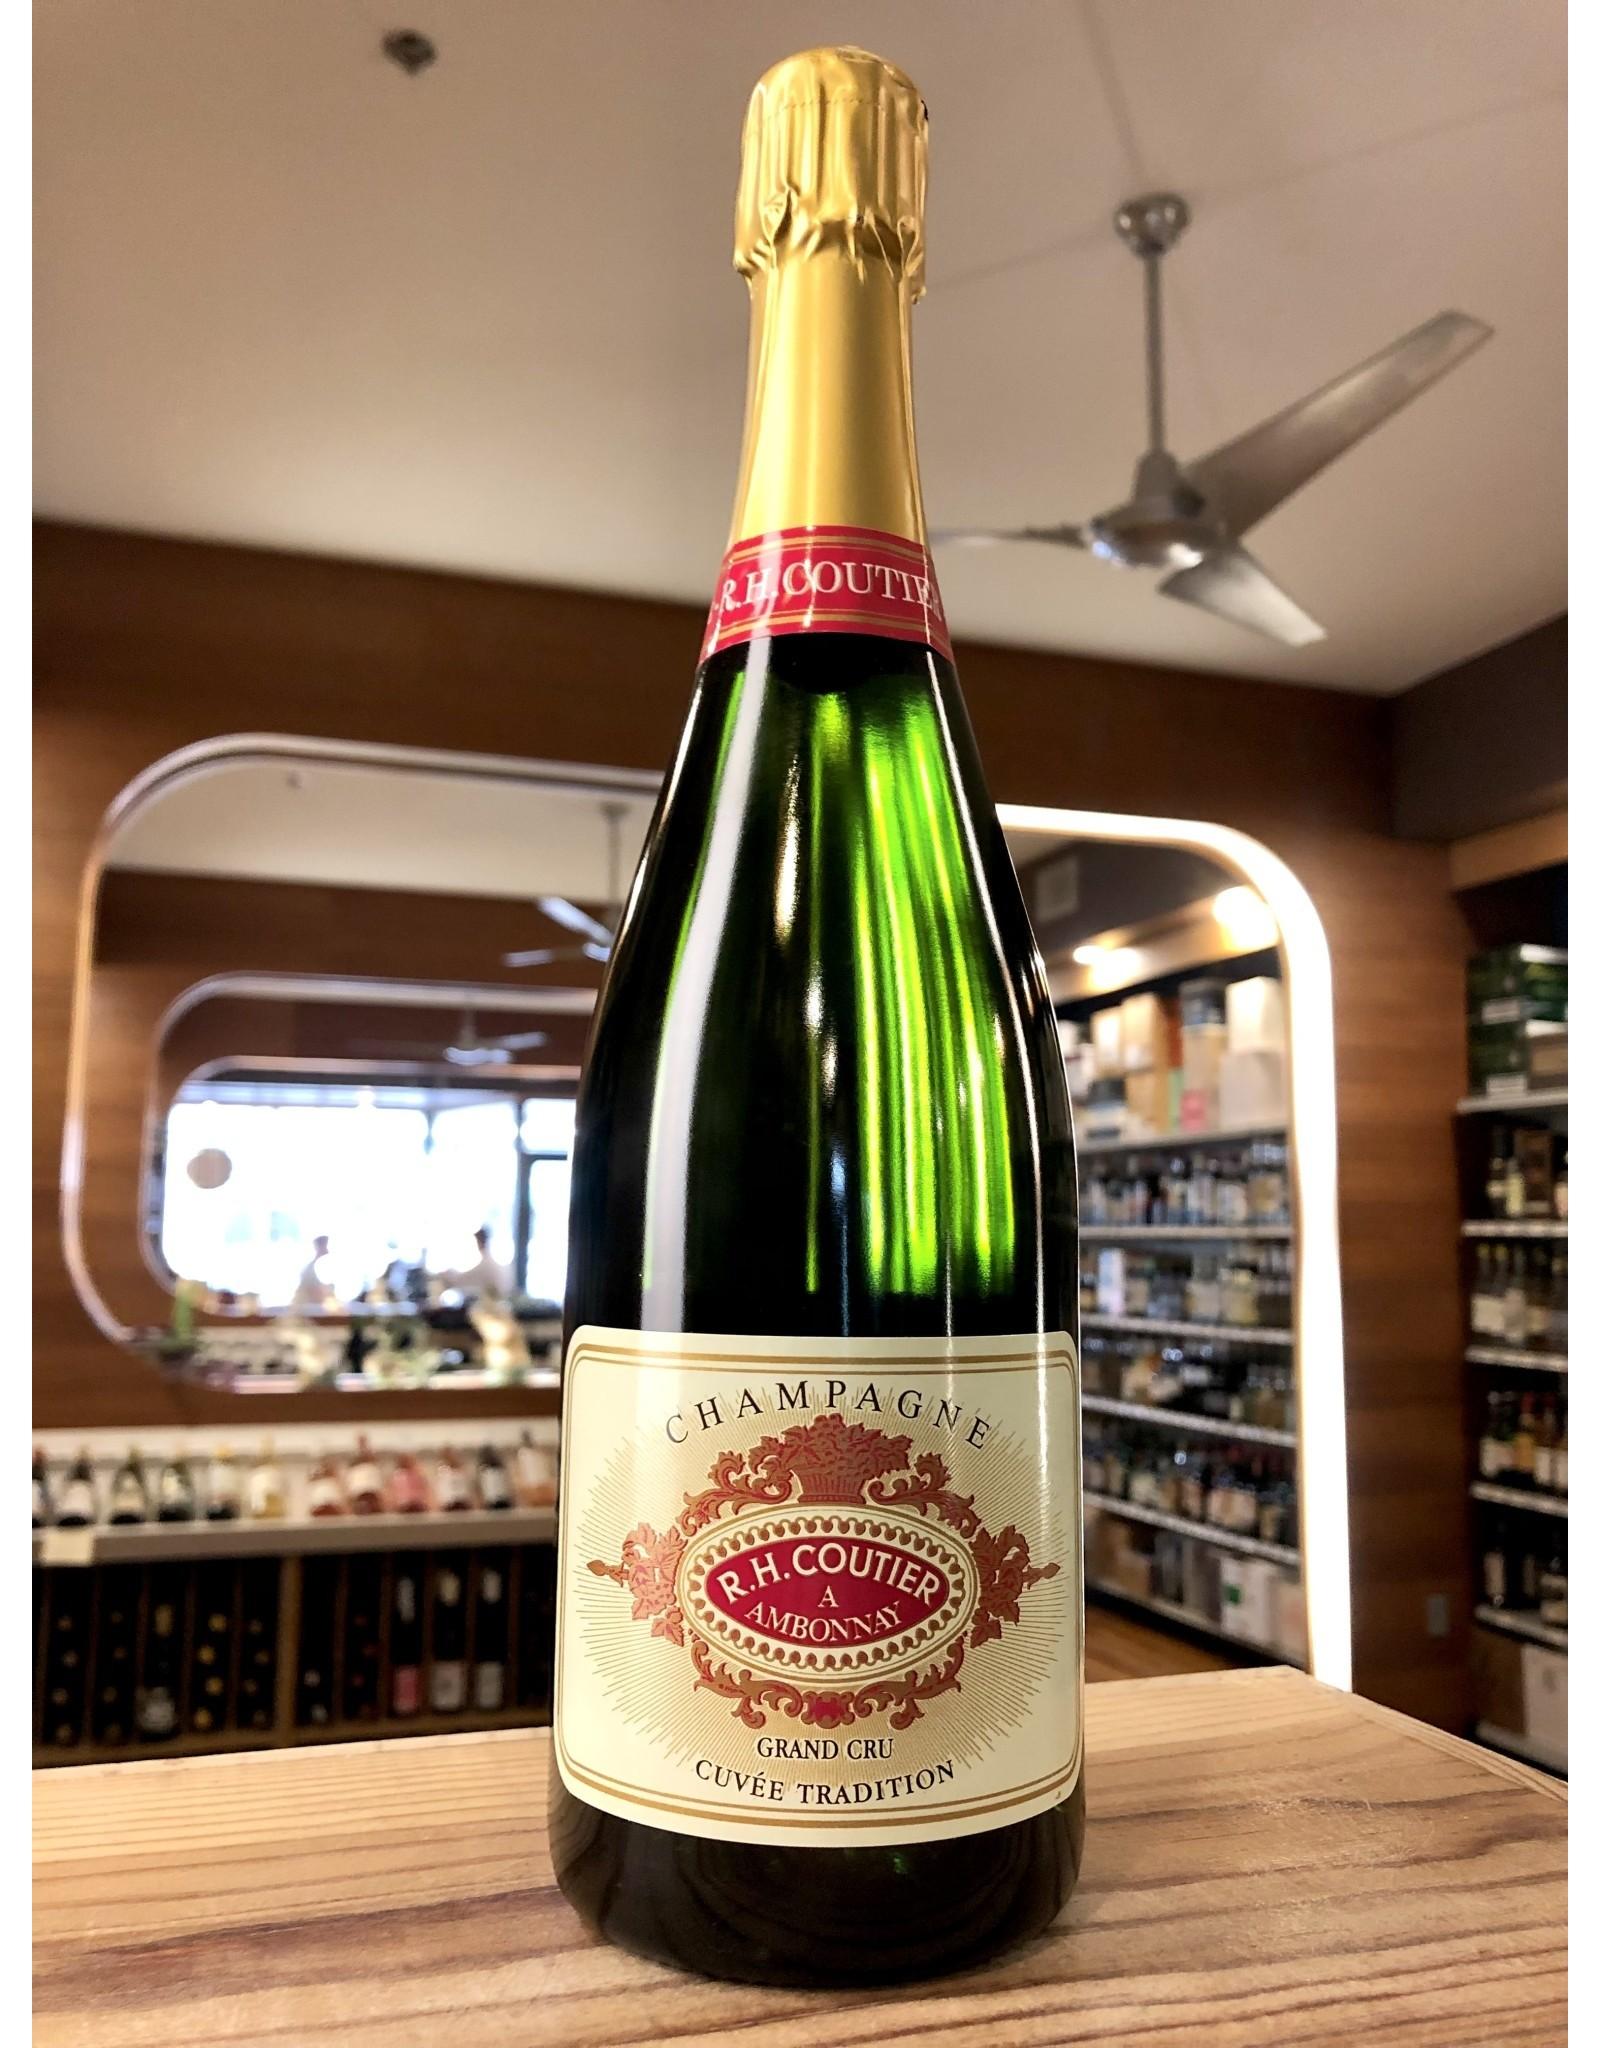 RH Coutier Grand Cru Brut Tradition Champagne - 750 ML